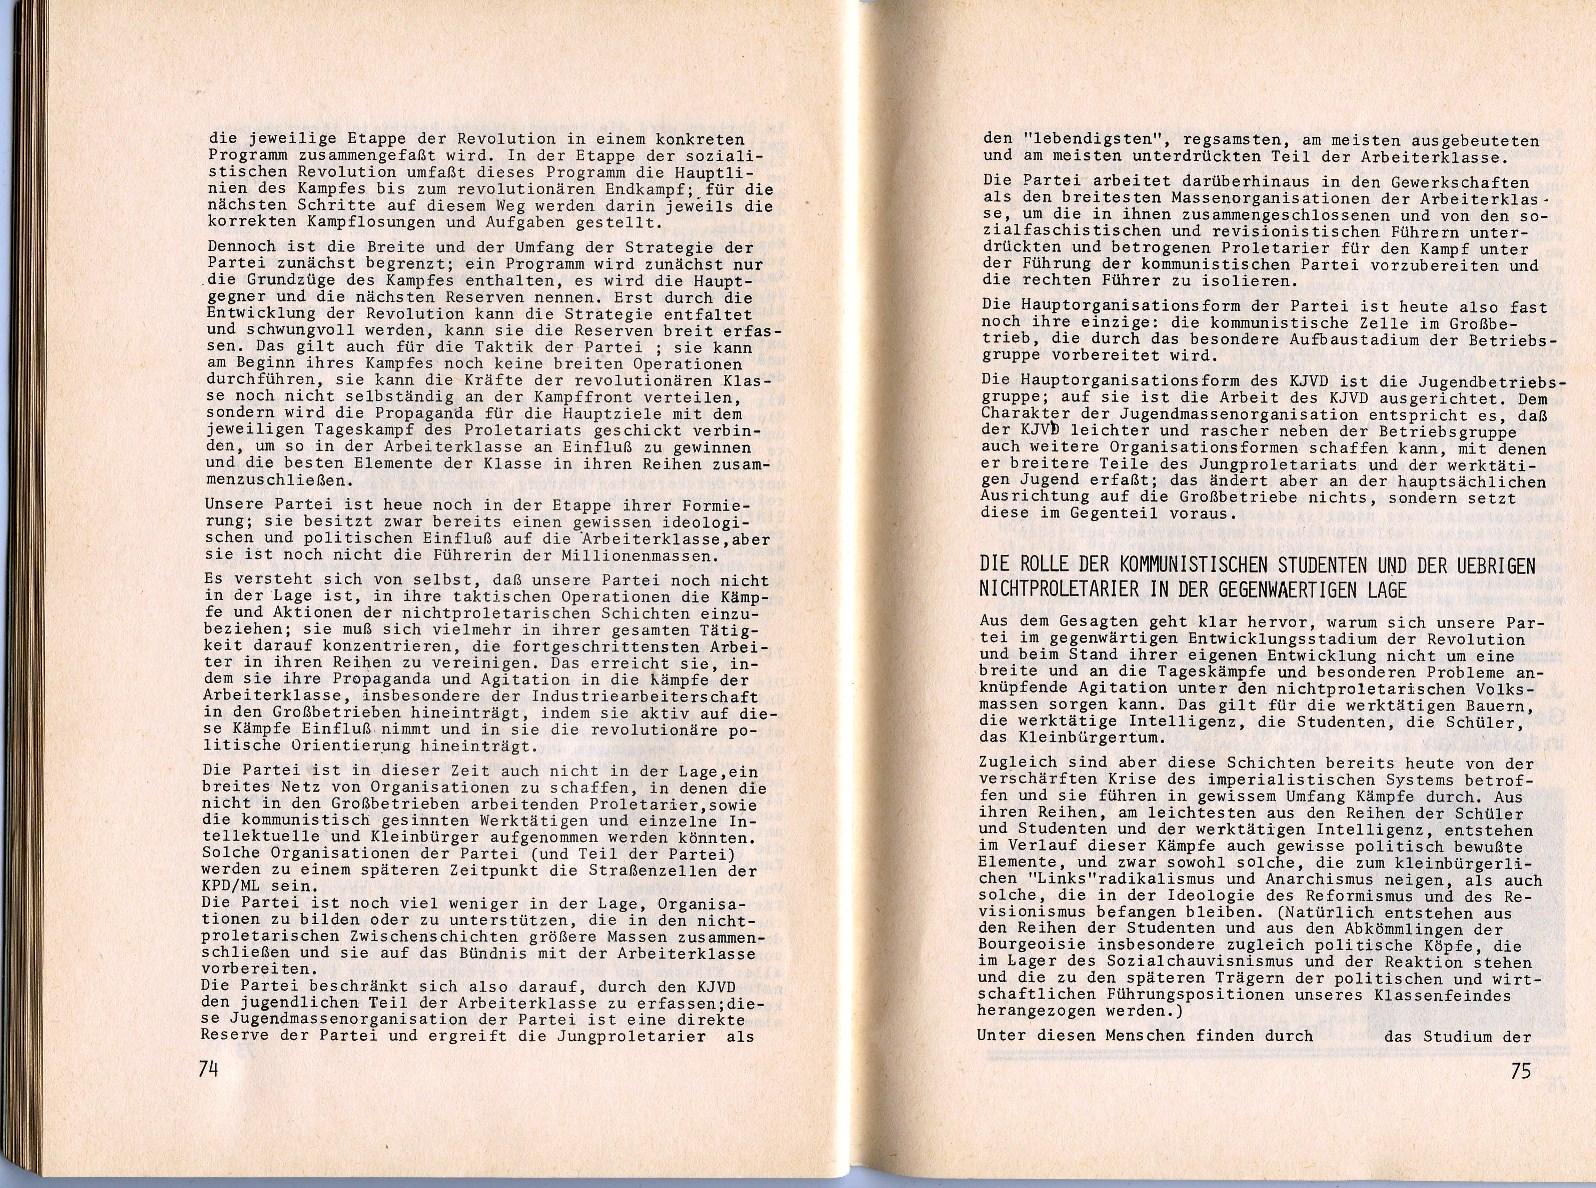 ZB_Parteiarbeiter_1971_07_39